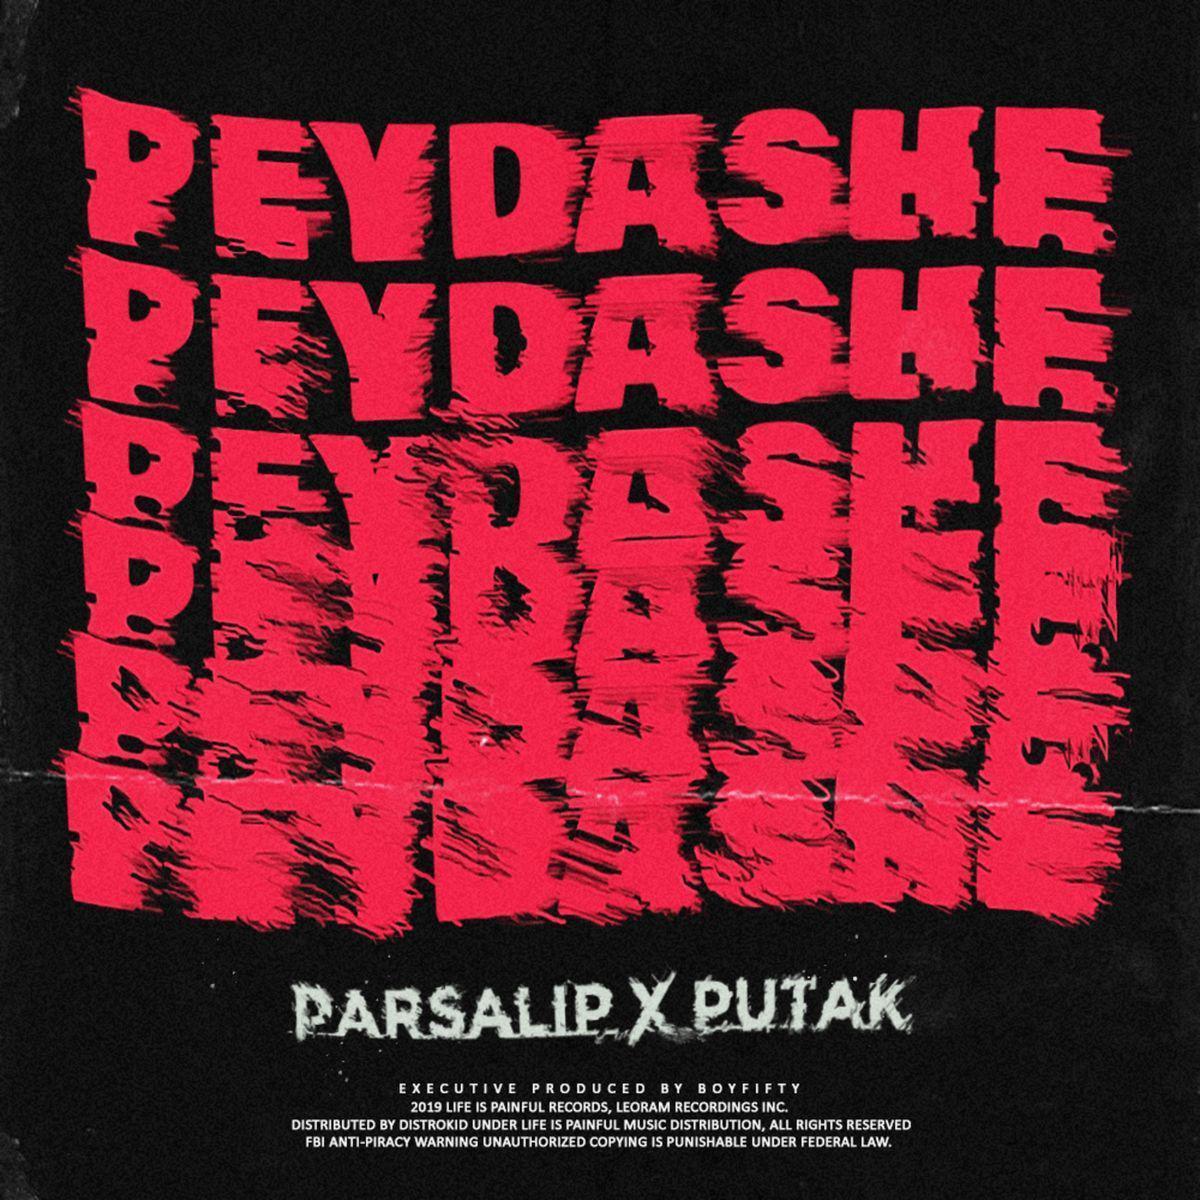 Peydashe (Ft ParsaLip)